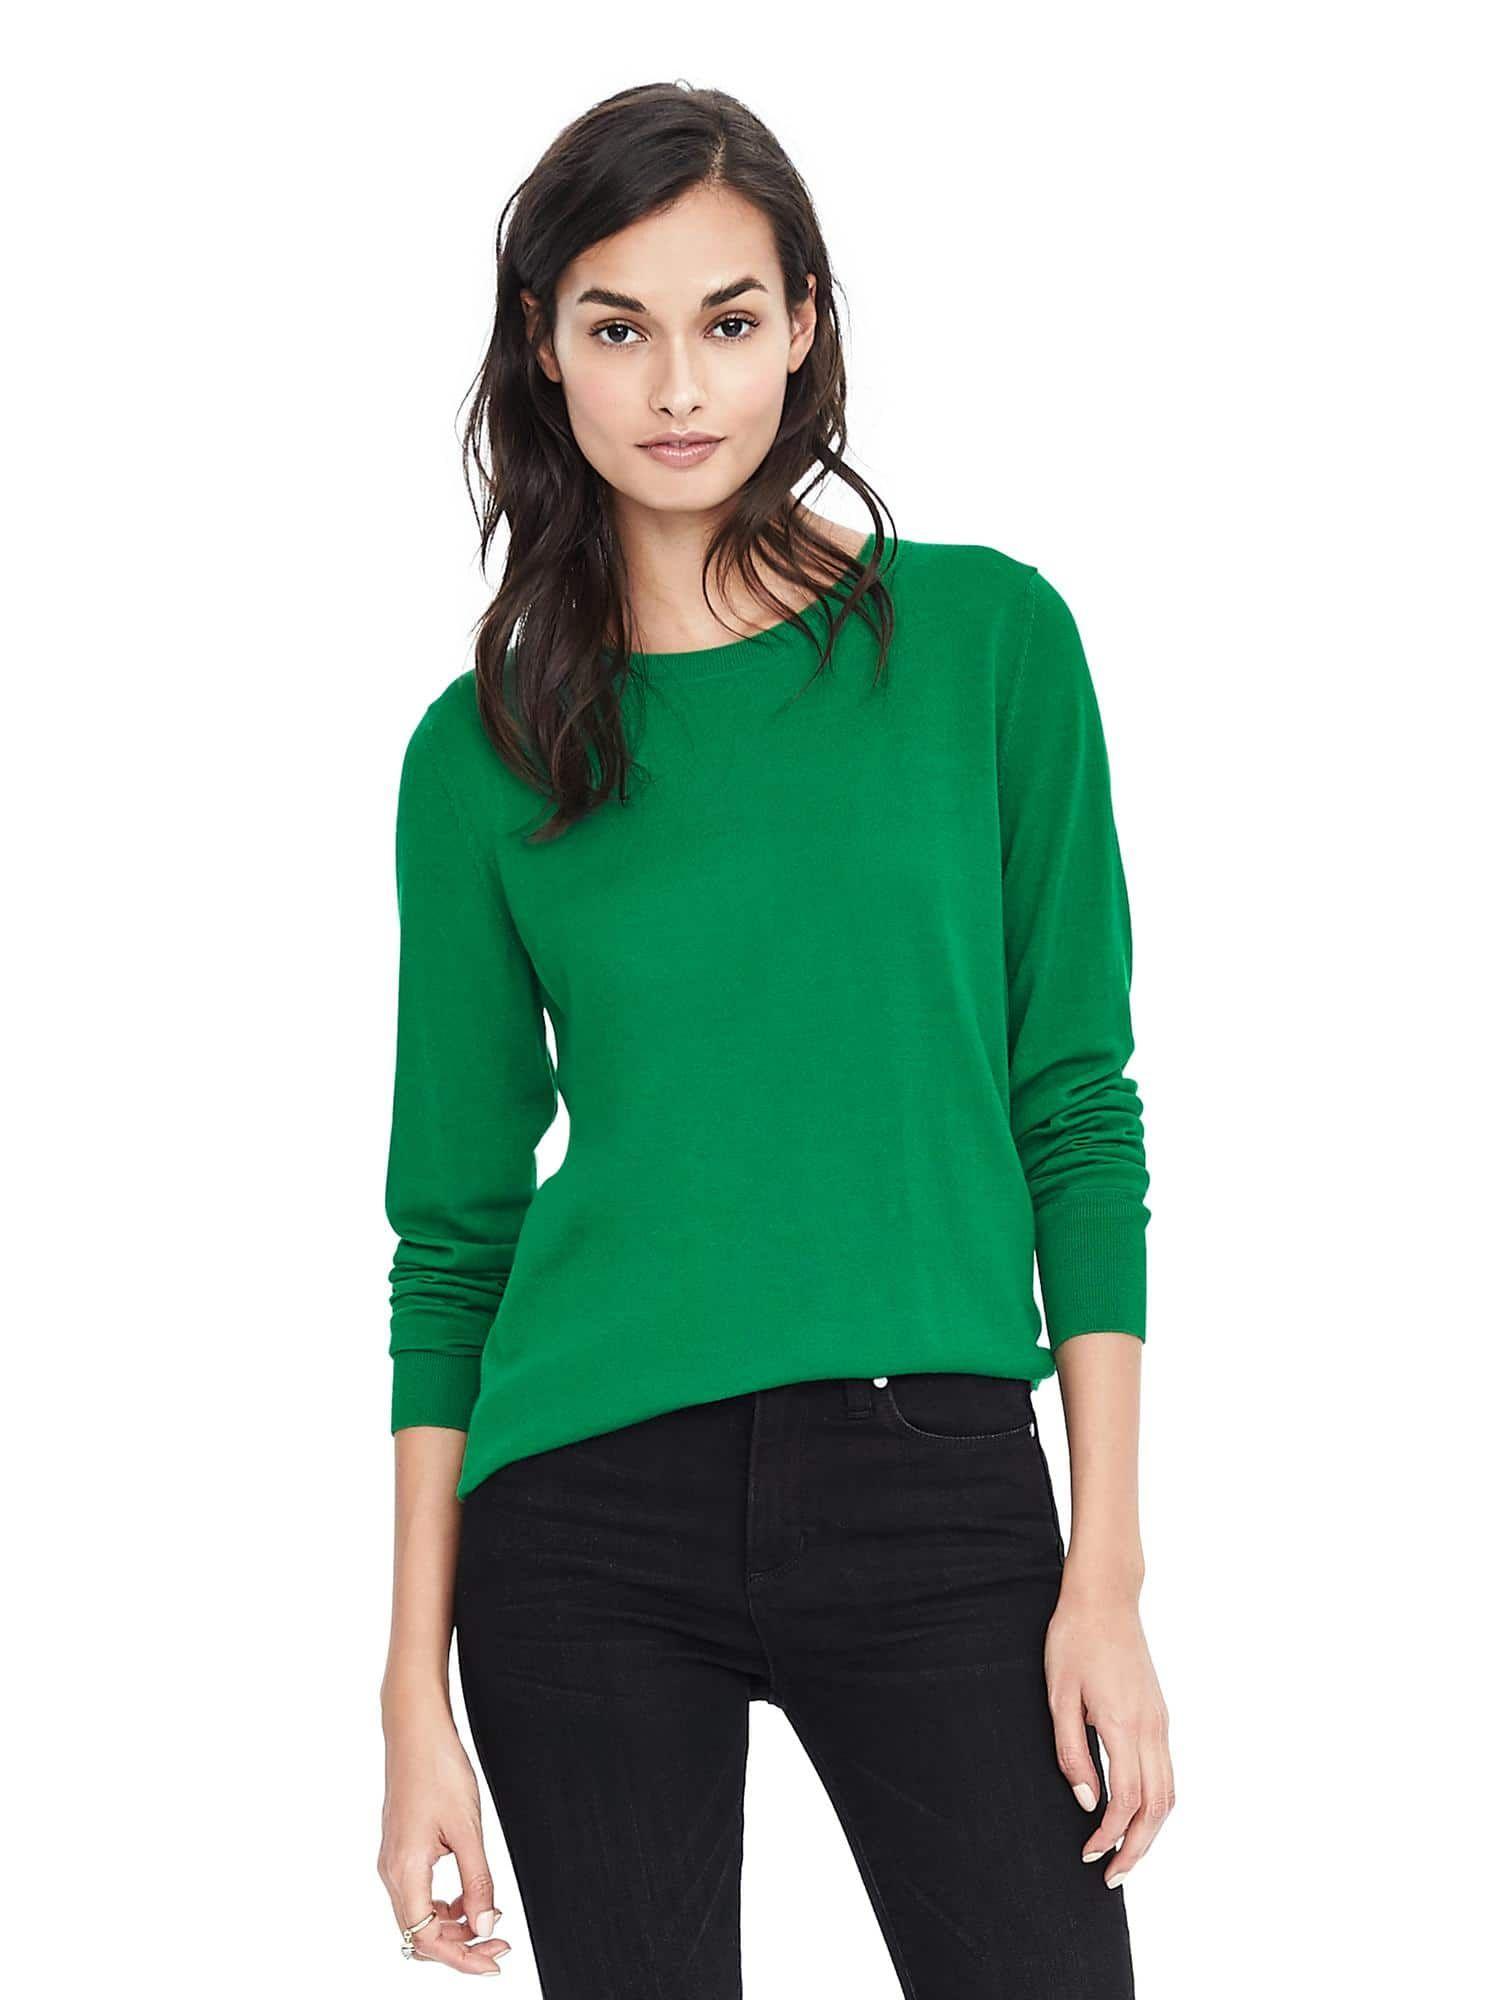 96affc6ed0 Merino Crew Sweater in Kelly Green